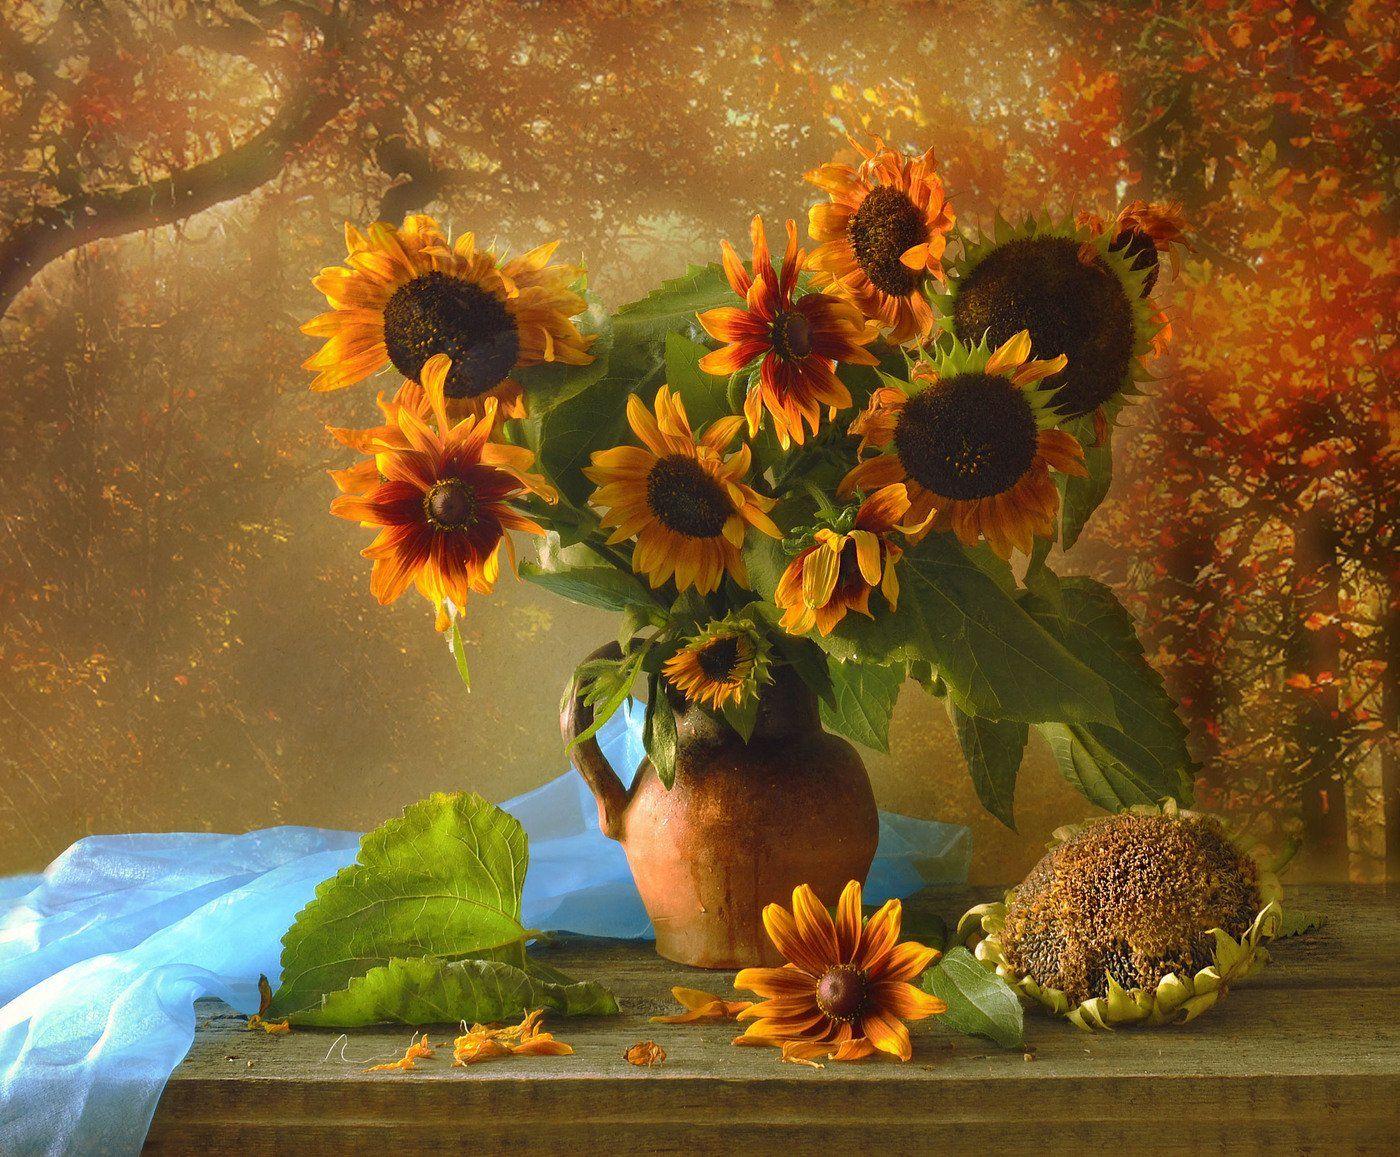 still life,натюрморт, август ,лето ,подсолнухи, фото натюрморт,, Колова Валентина